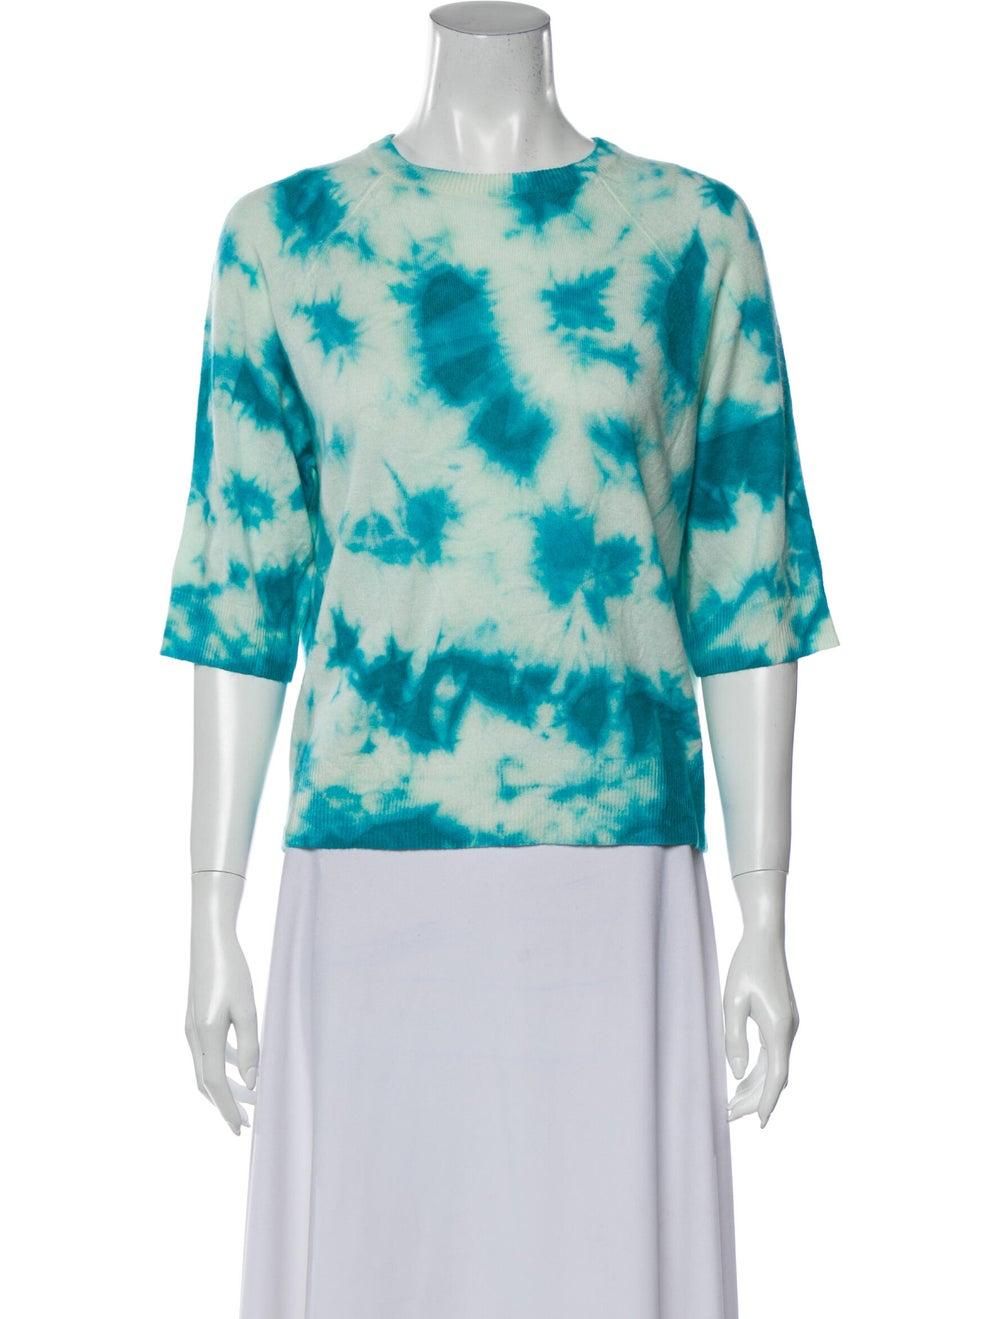 Michael Kors Cashmere Tie-Dye Print Sweater Blue - image 1